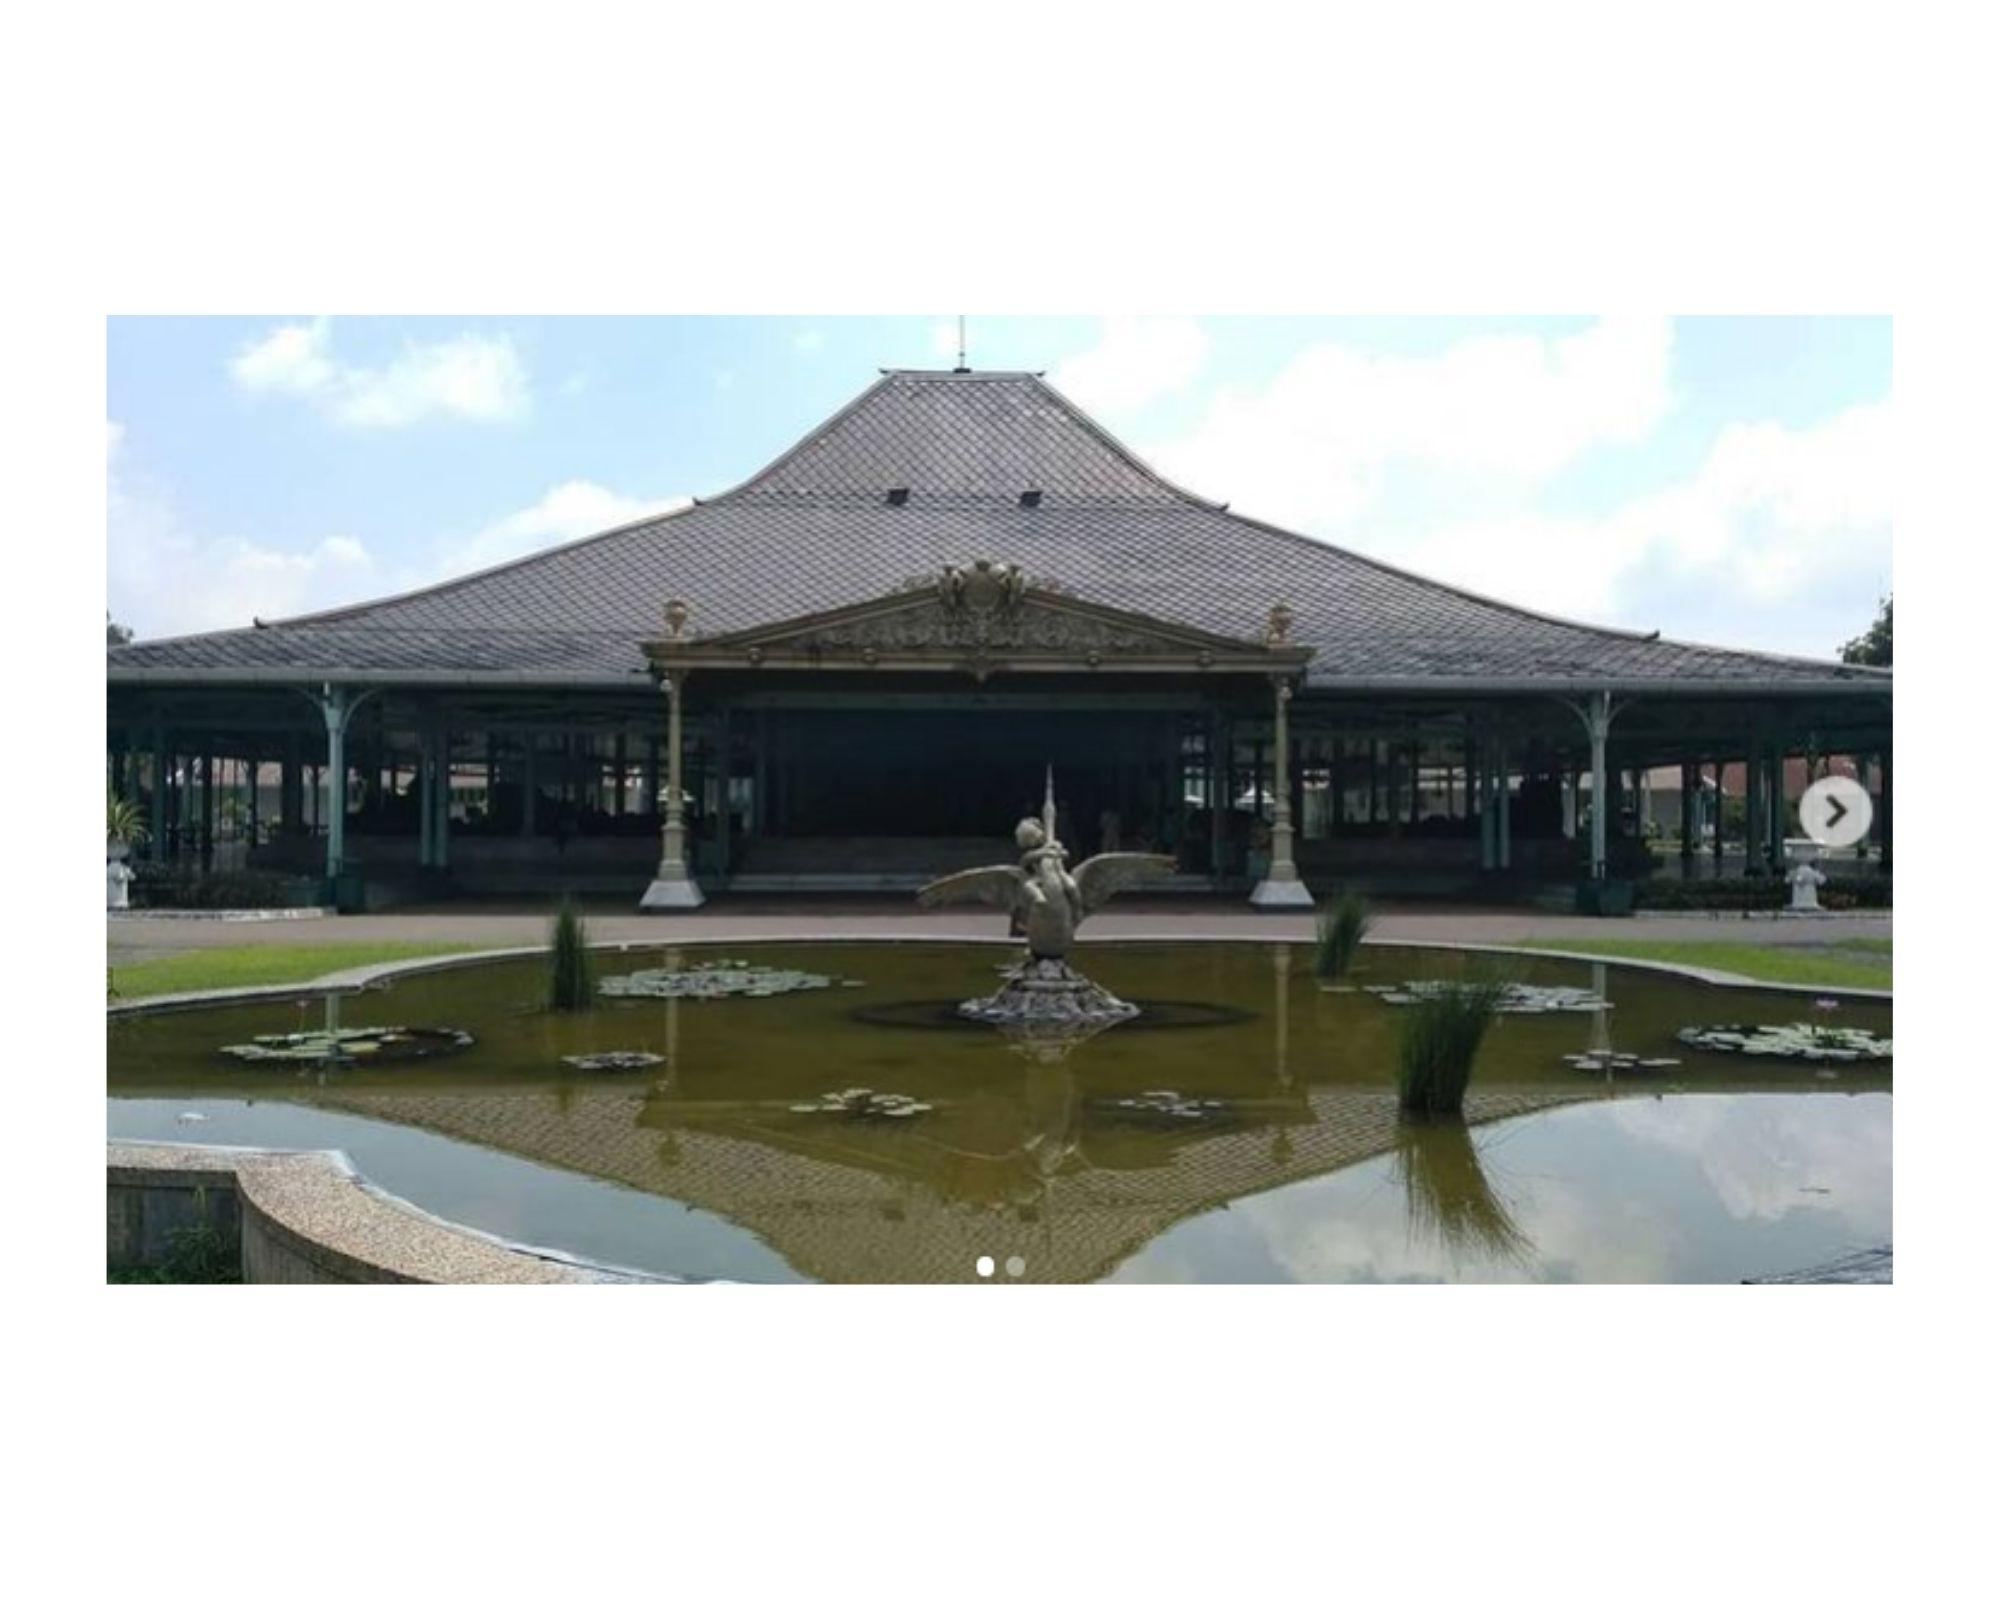 Read more about the article Ragam Tema Ornamentasi, Kaligrafi Bagian 3 Jawa Tengah Sebuah Potret Warisan Budaya